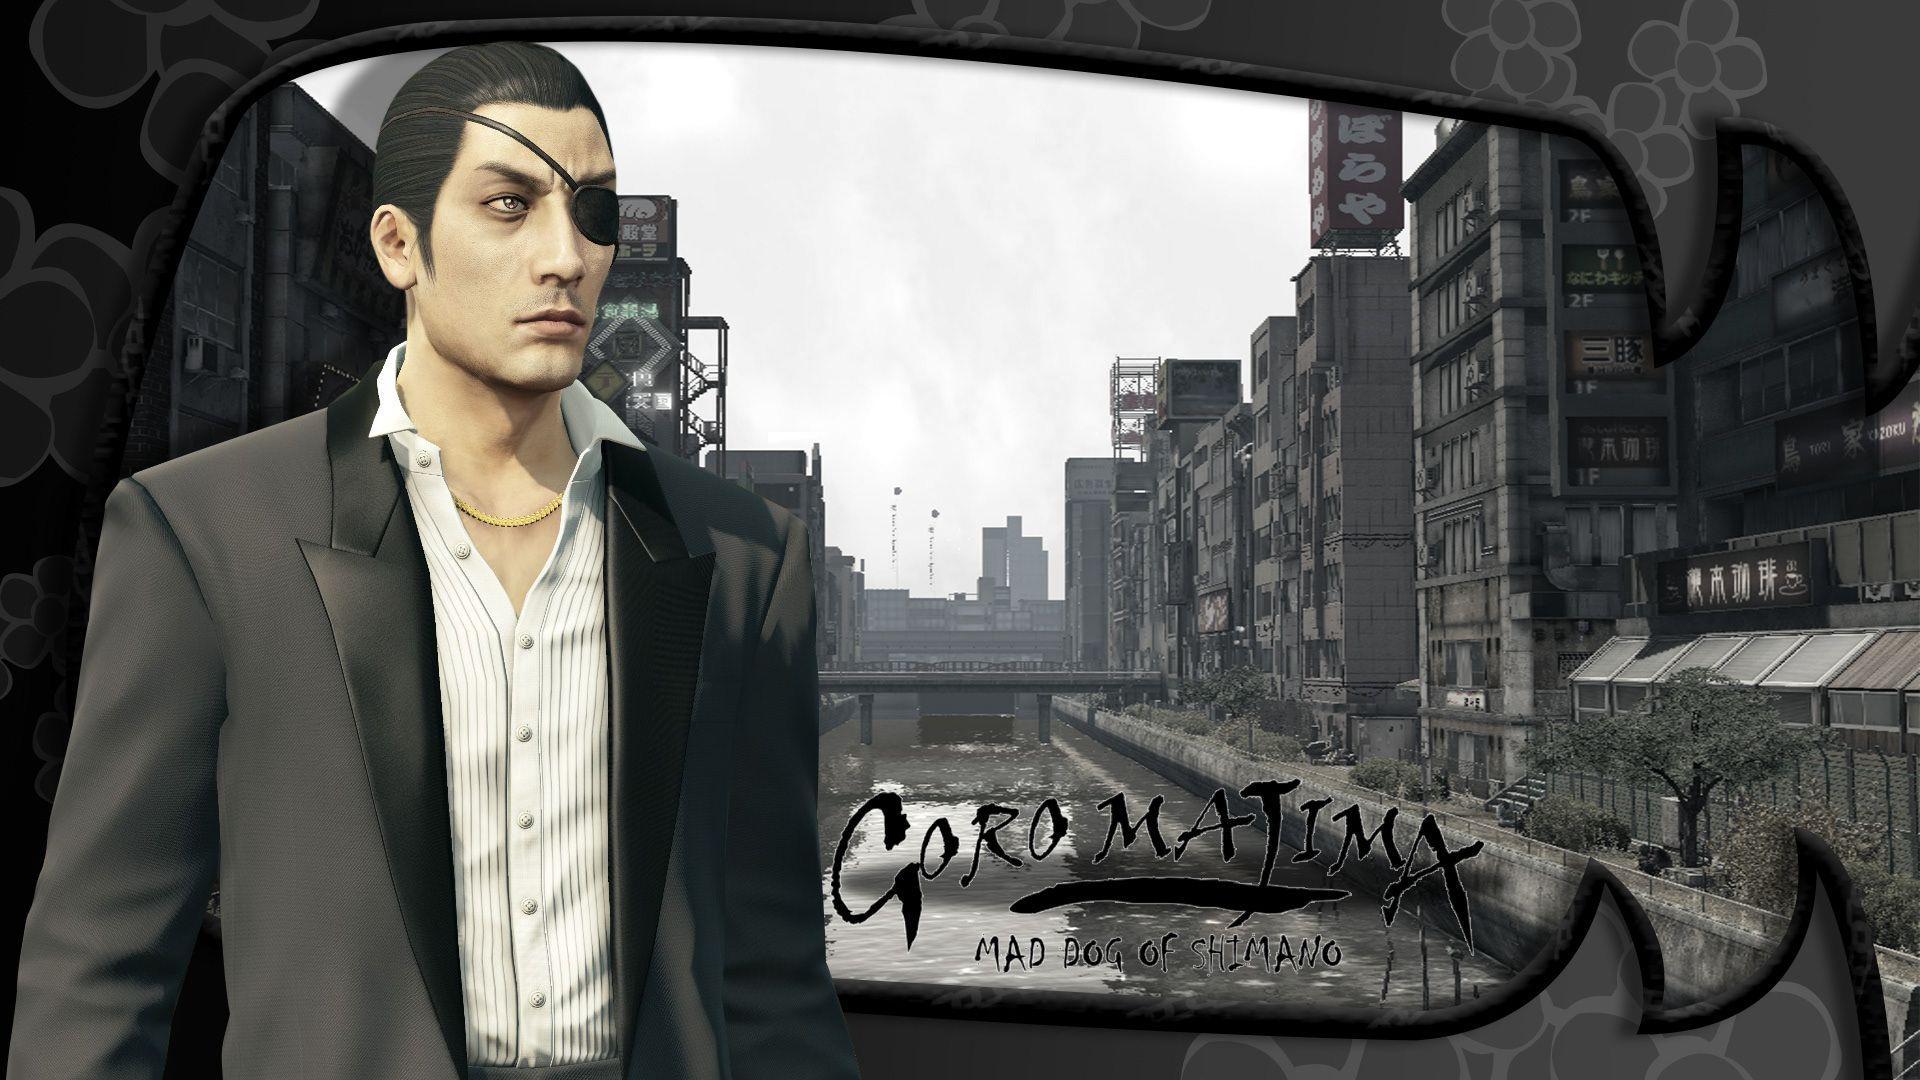 Yakuza HD Wallpapers - Top Free Yakuza HD Backgrounds ...